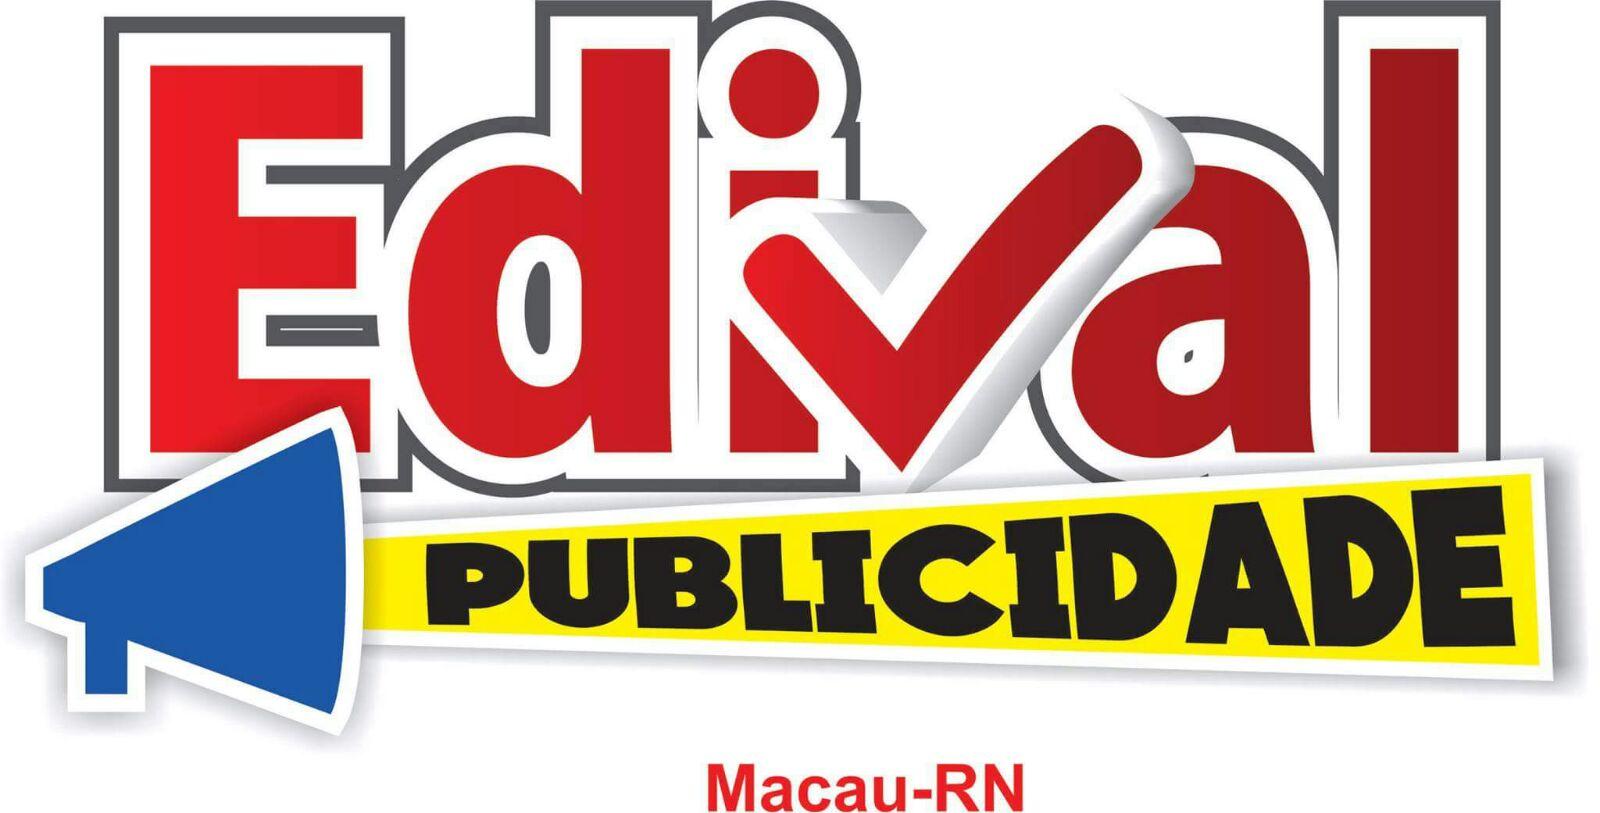 EDIVAL PUBLICIDADE